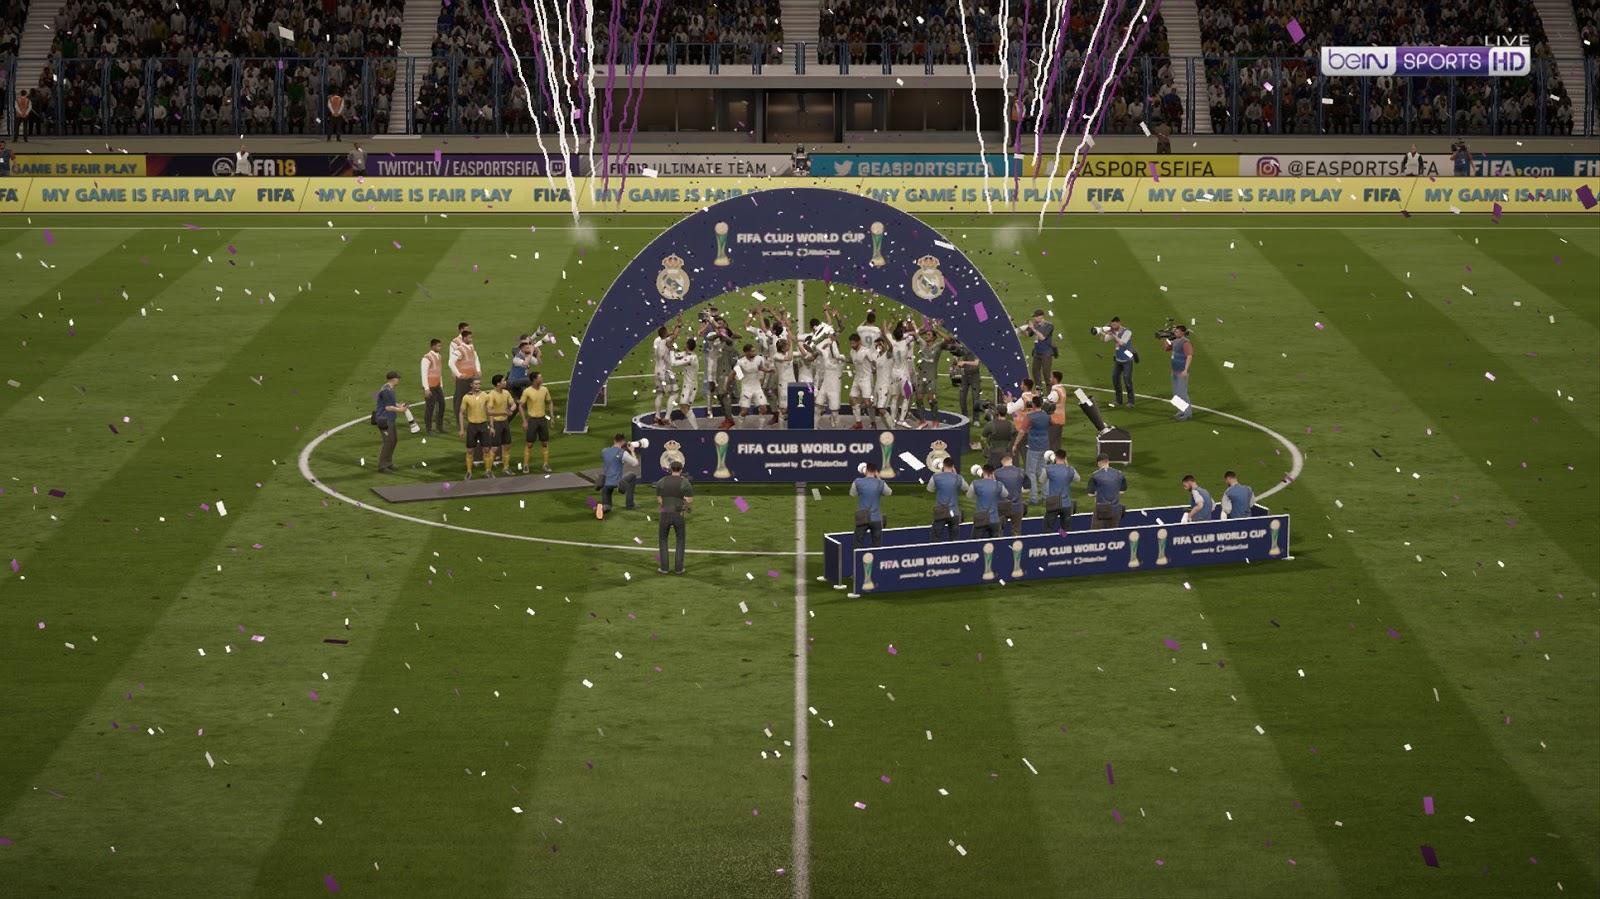 Fantastic Ea Sports World Cup 2018 - big_2%2B%25281%2529  2018_635184 .jpg